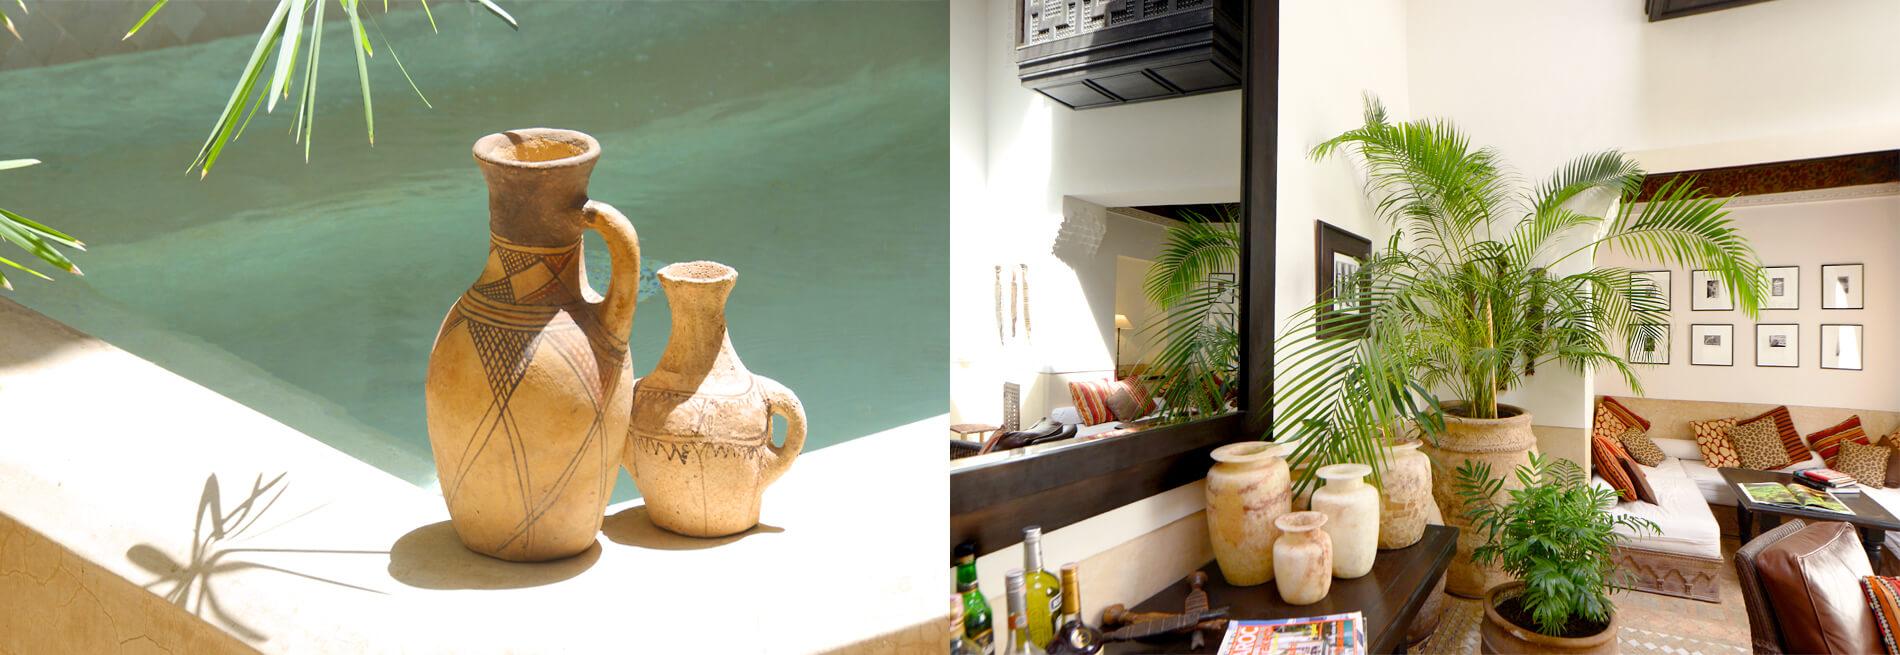 Riad avec piscine à Marrakech